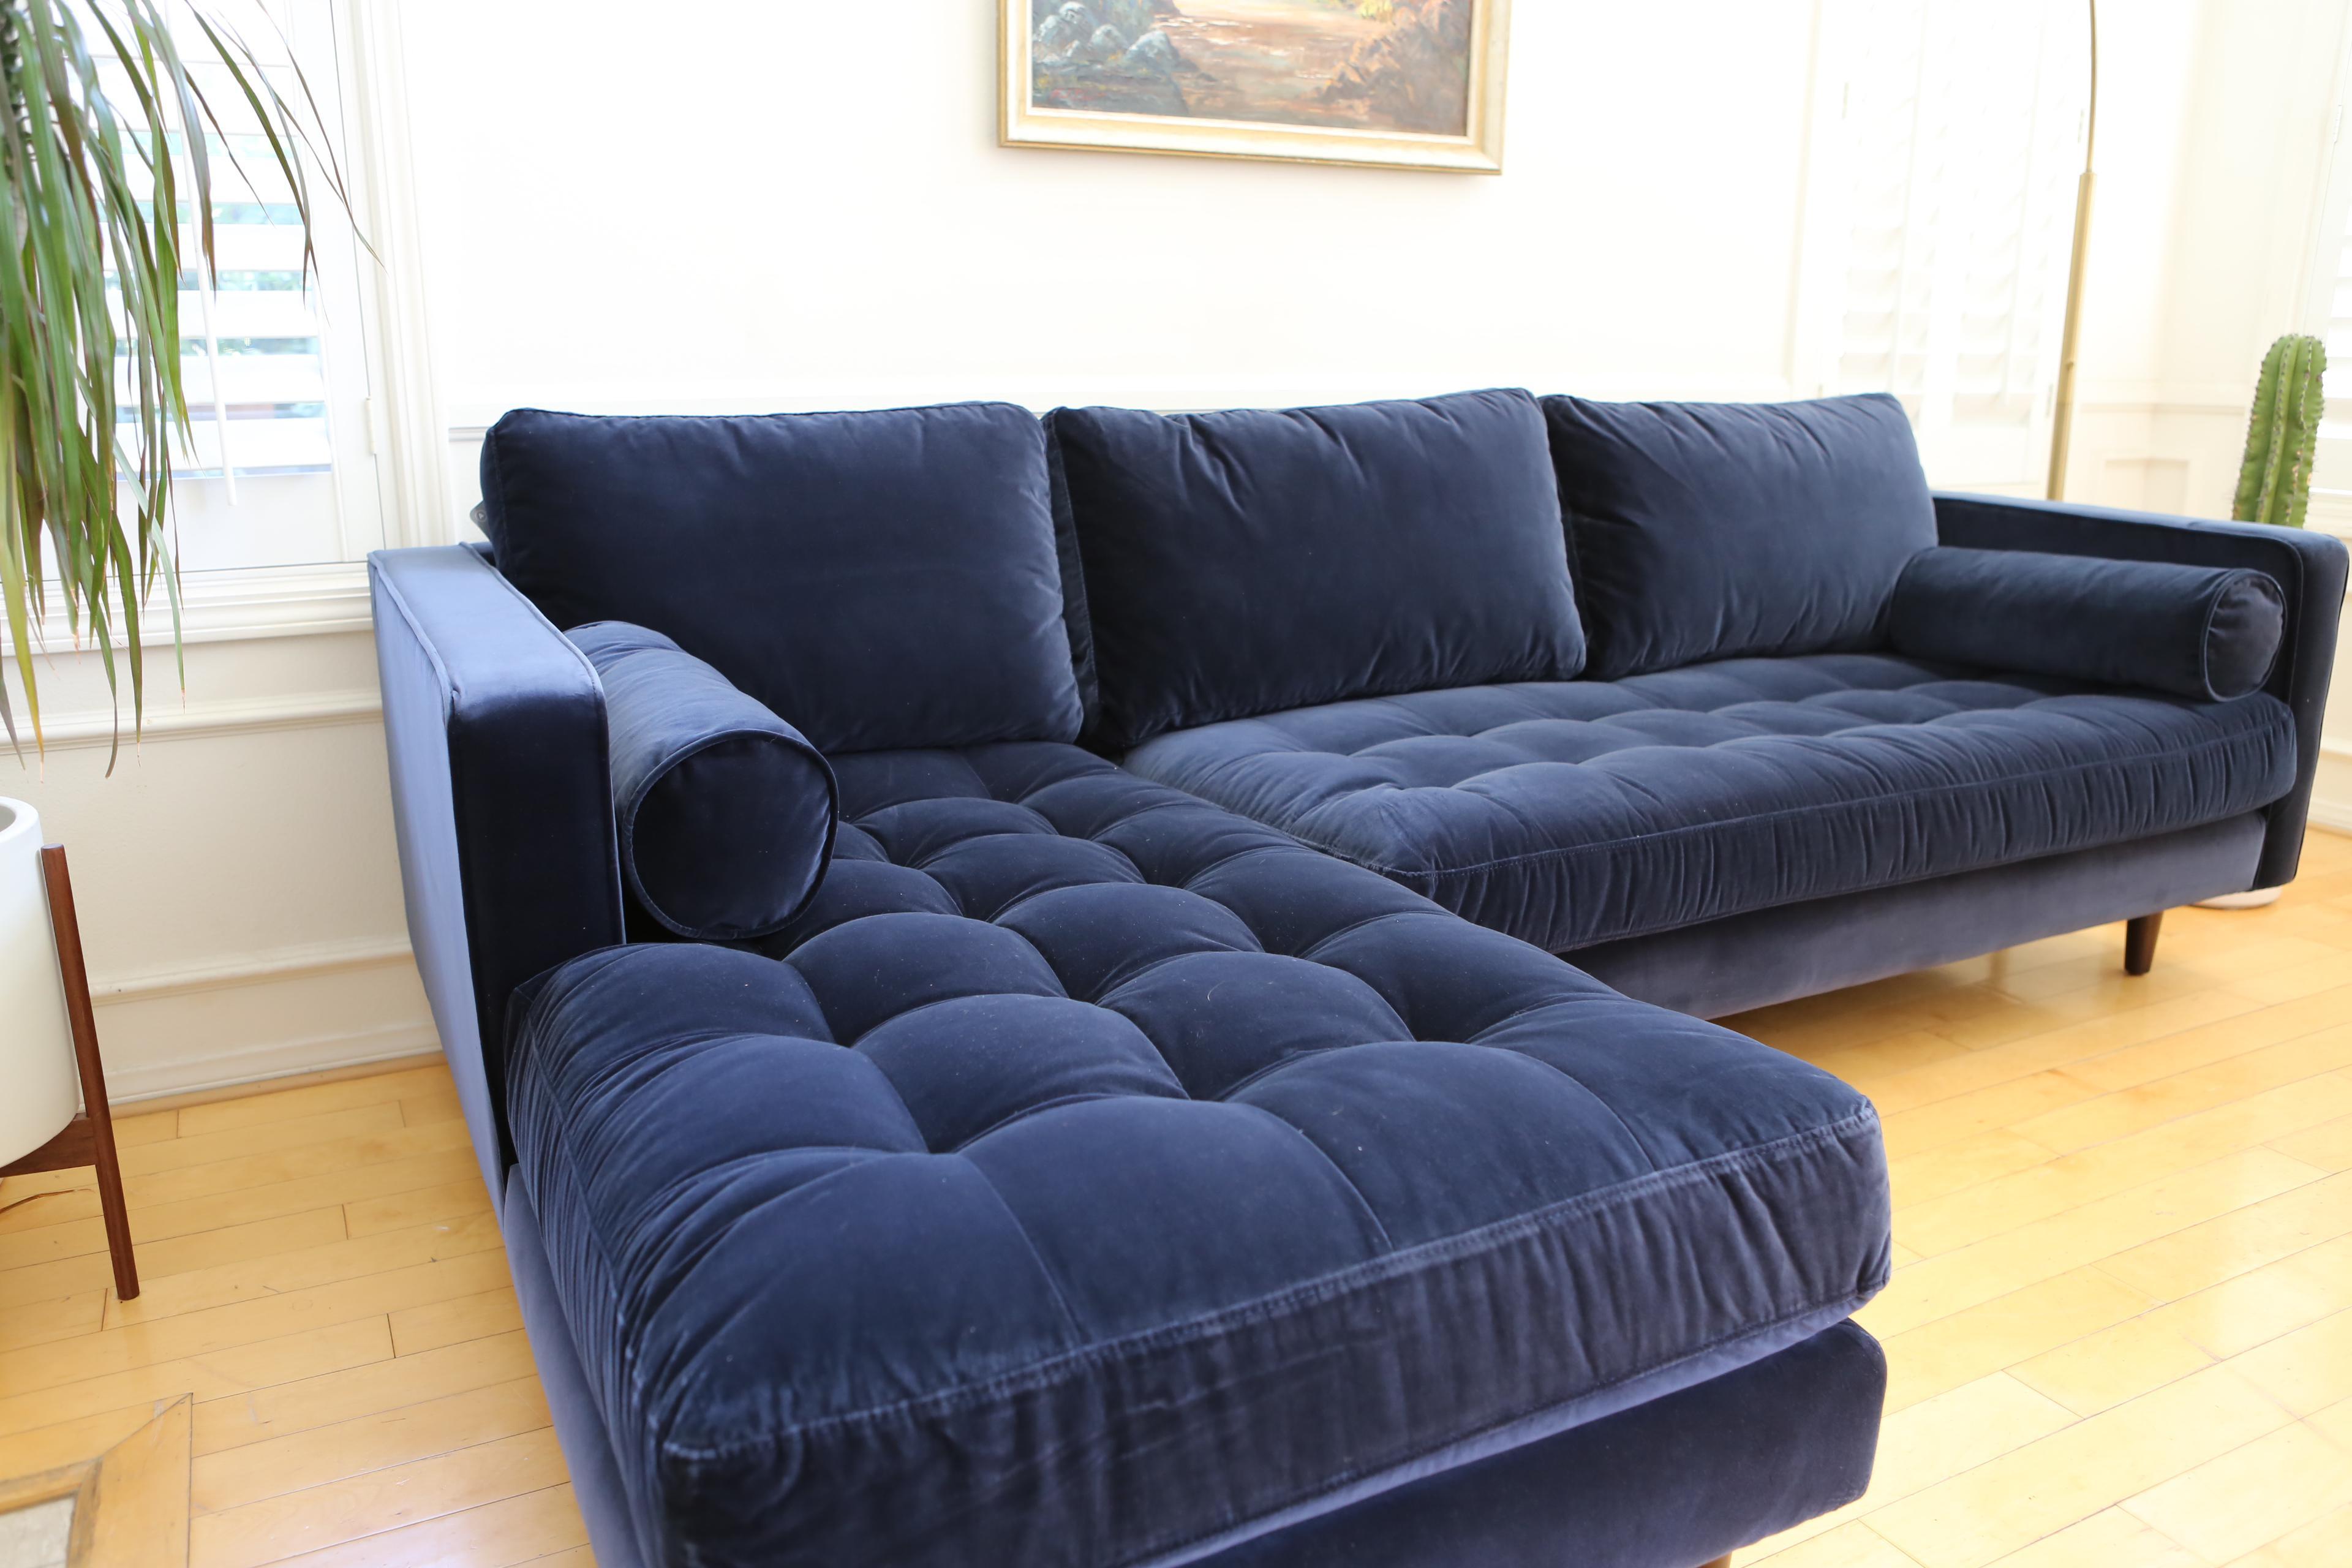 abbie sofa navy bristol second hand left facing sectional design inspiration creative